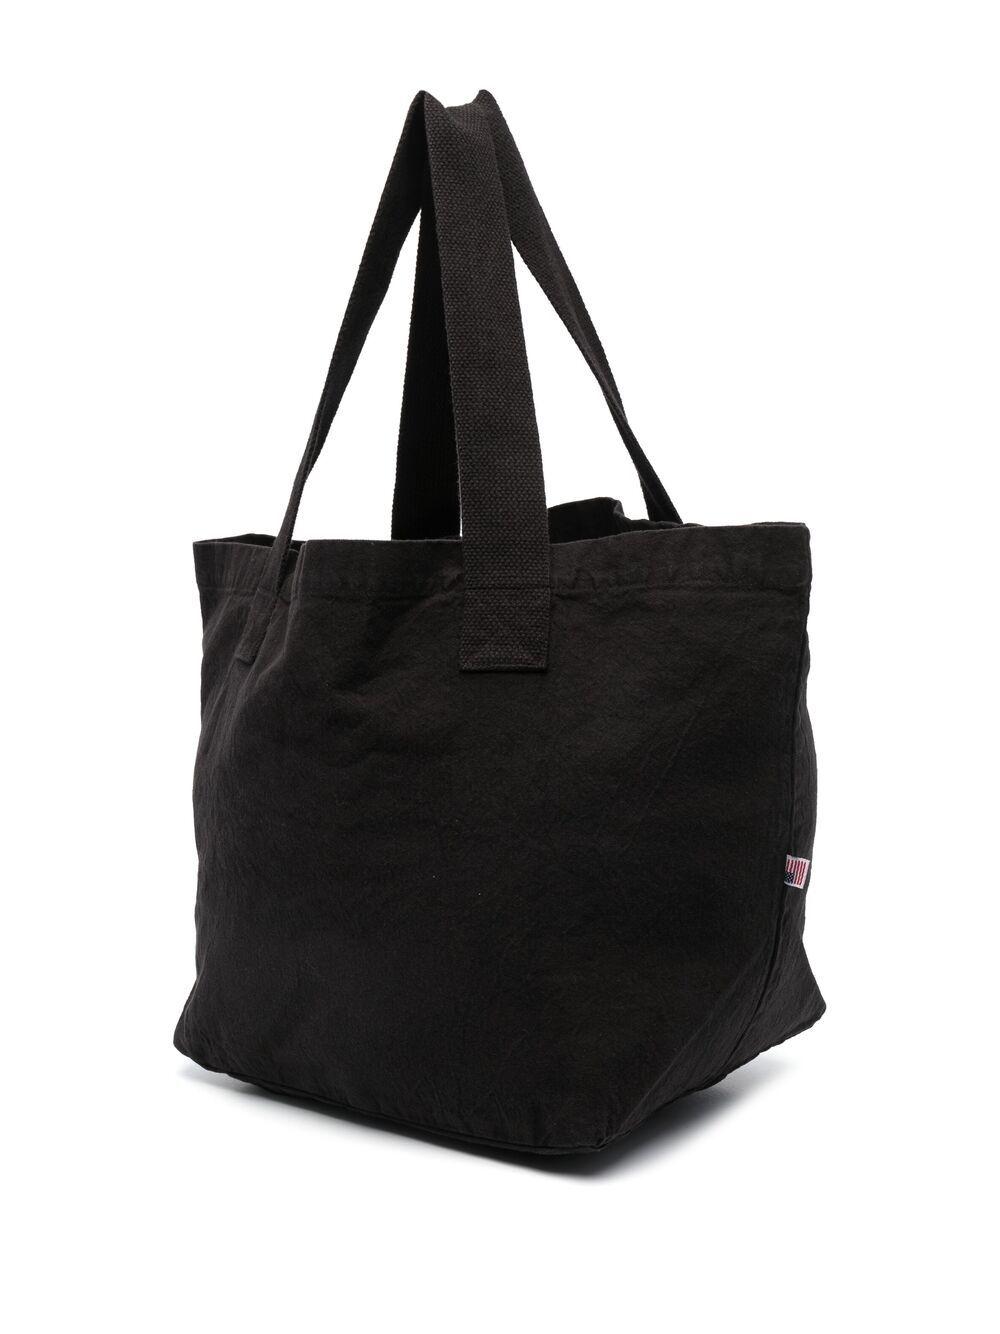 Sporty & Rich logo printed bag unisex black SPORTY & RICH | Bags | AC143BK